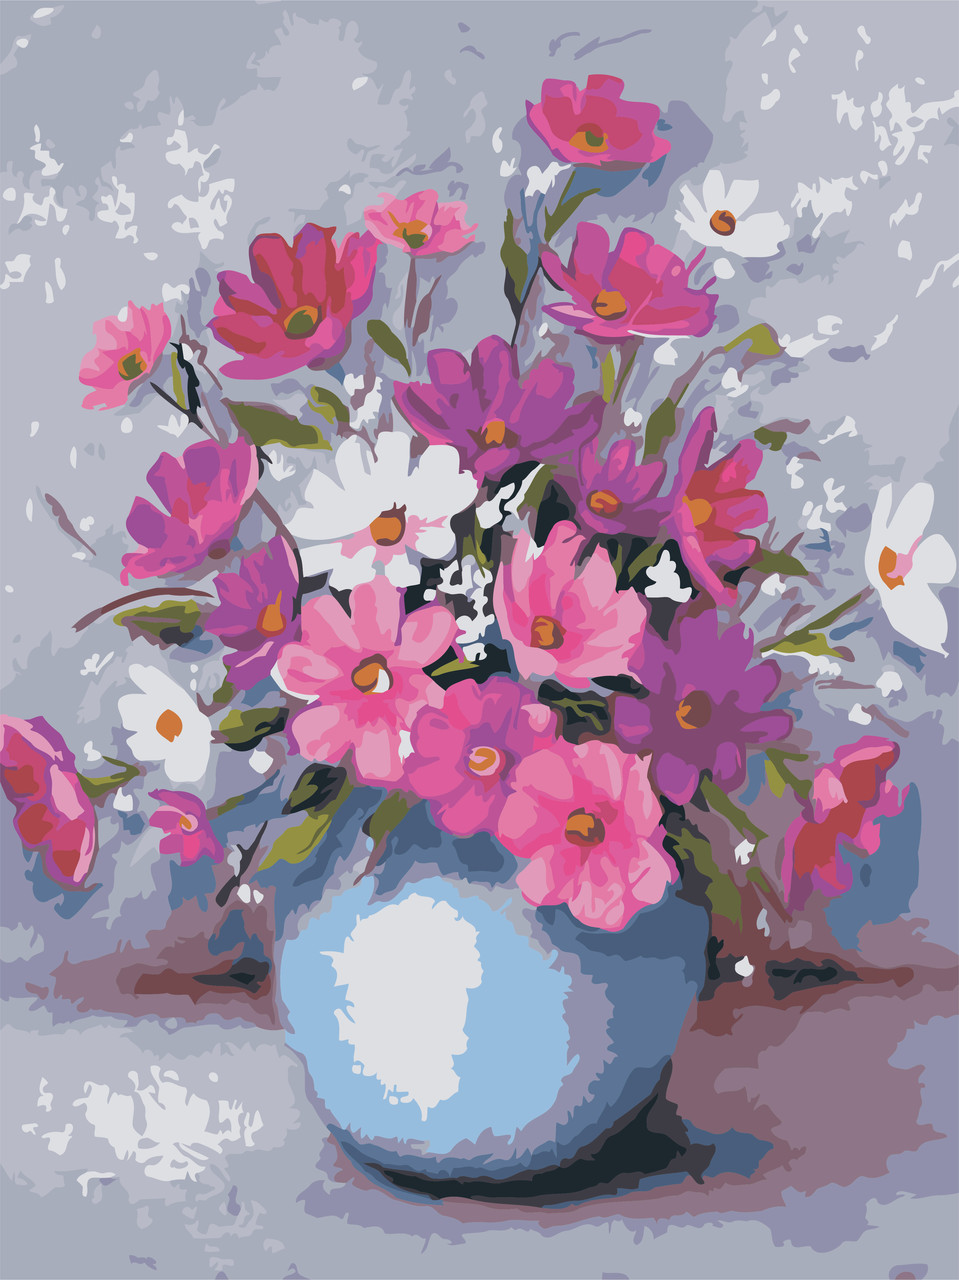 Рисование по номерам Цветы в вазе ArtStory AS0600 30 х 40 см (без коробки)